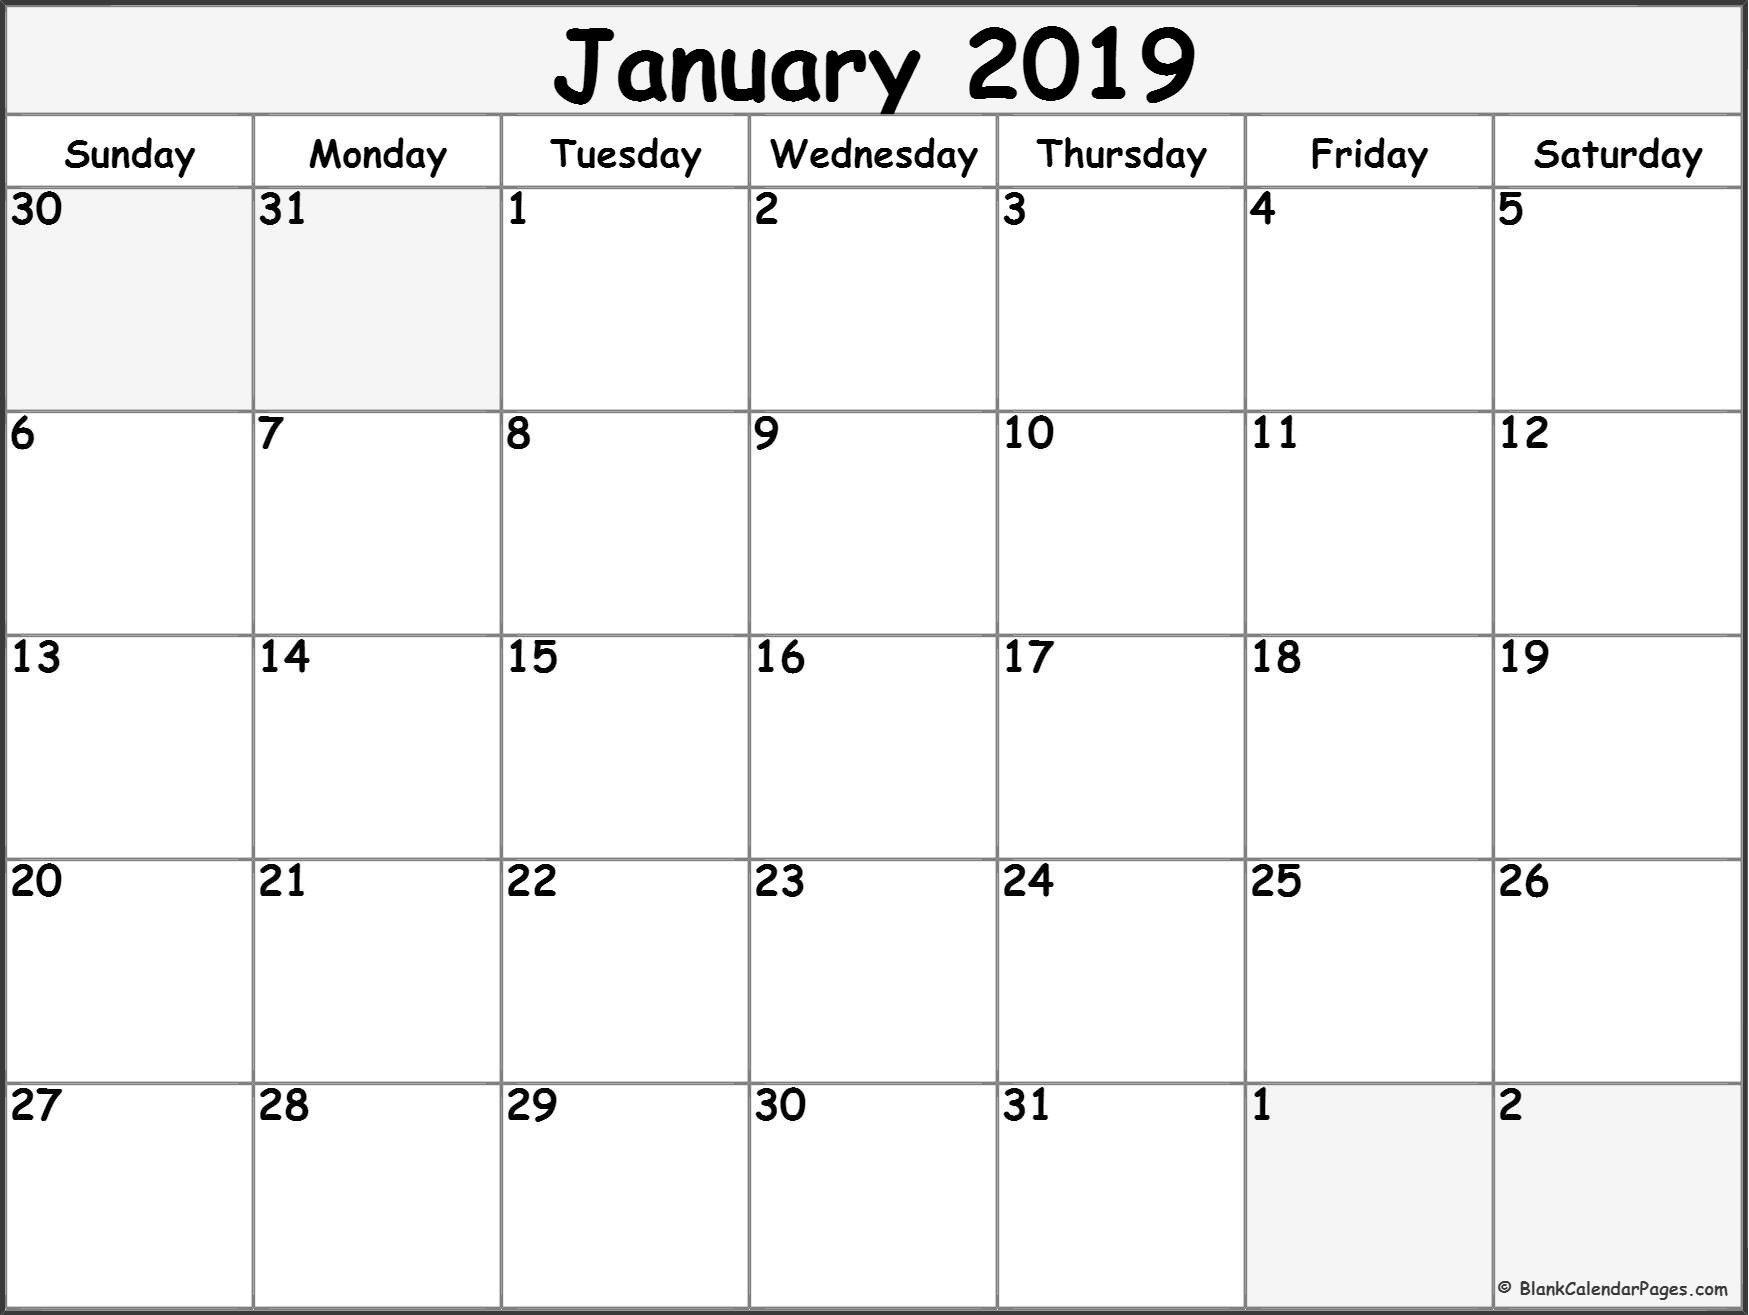 Free Printable Blank Calendars To Fill In - Calendar Fill In A Calendar